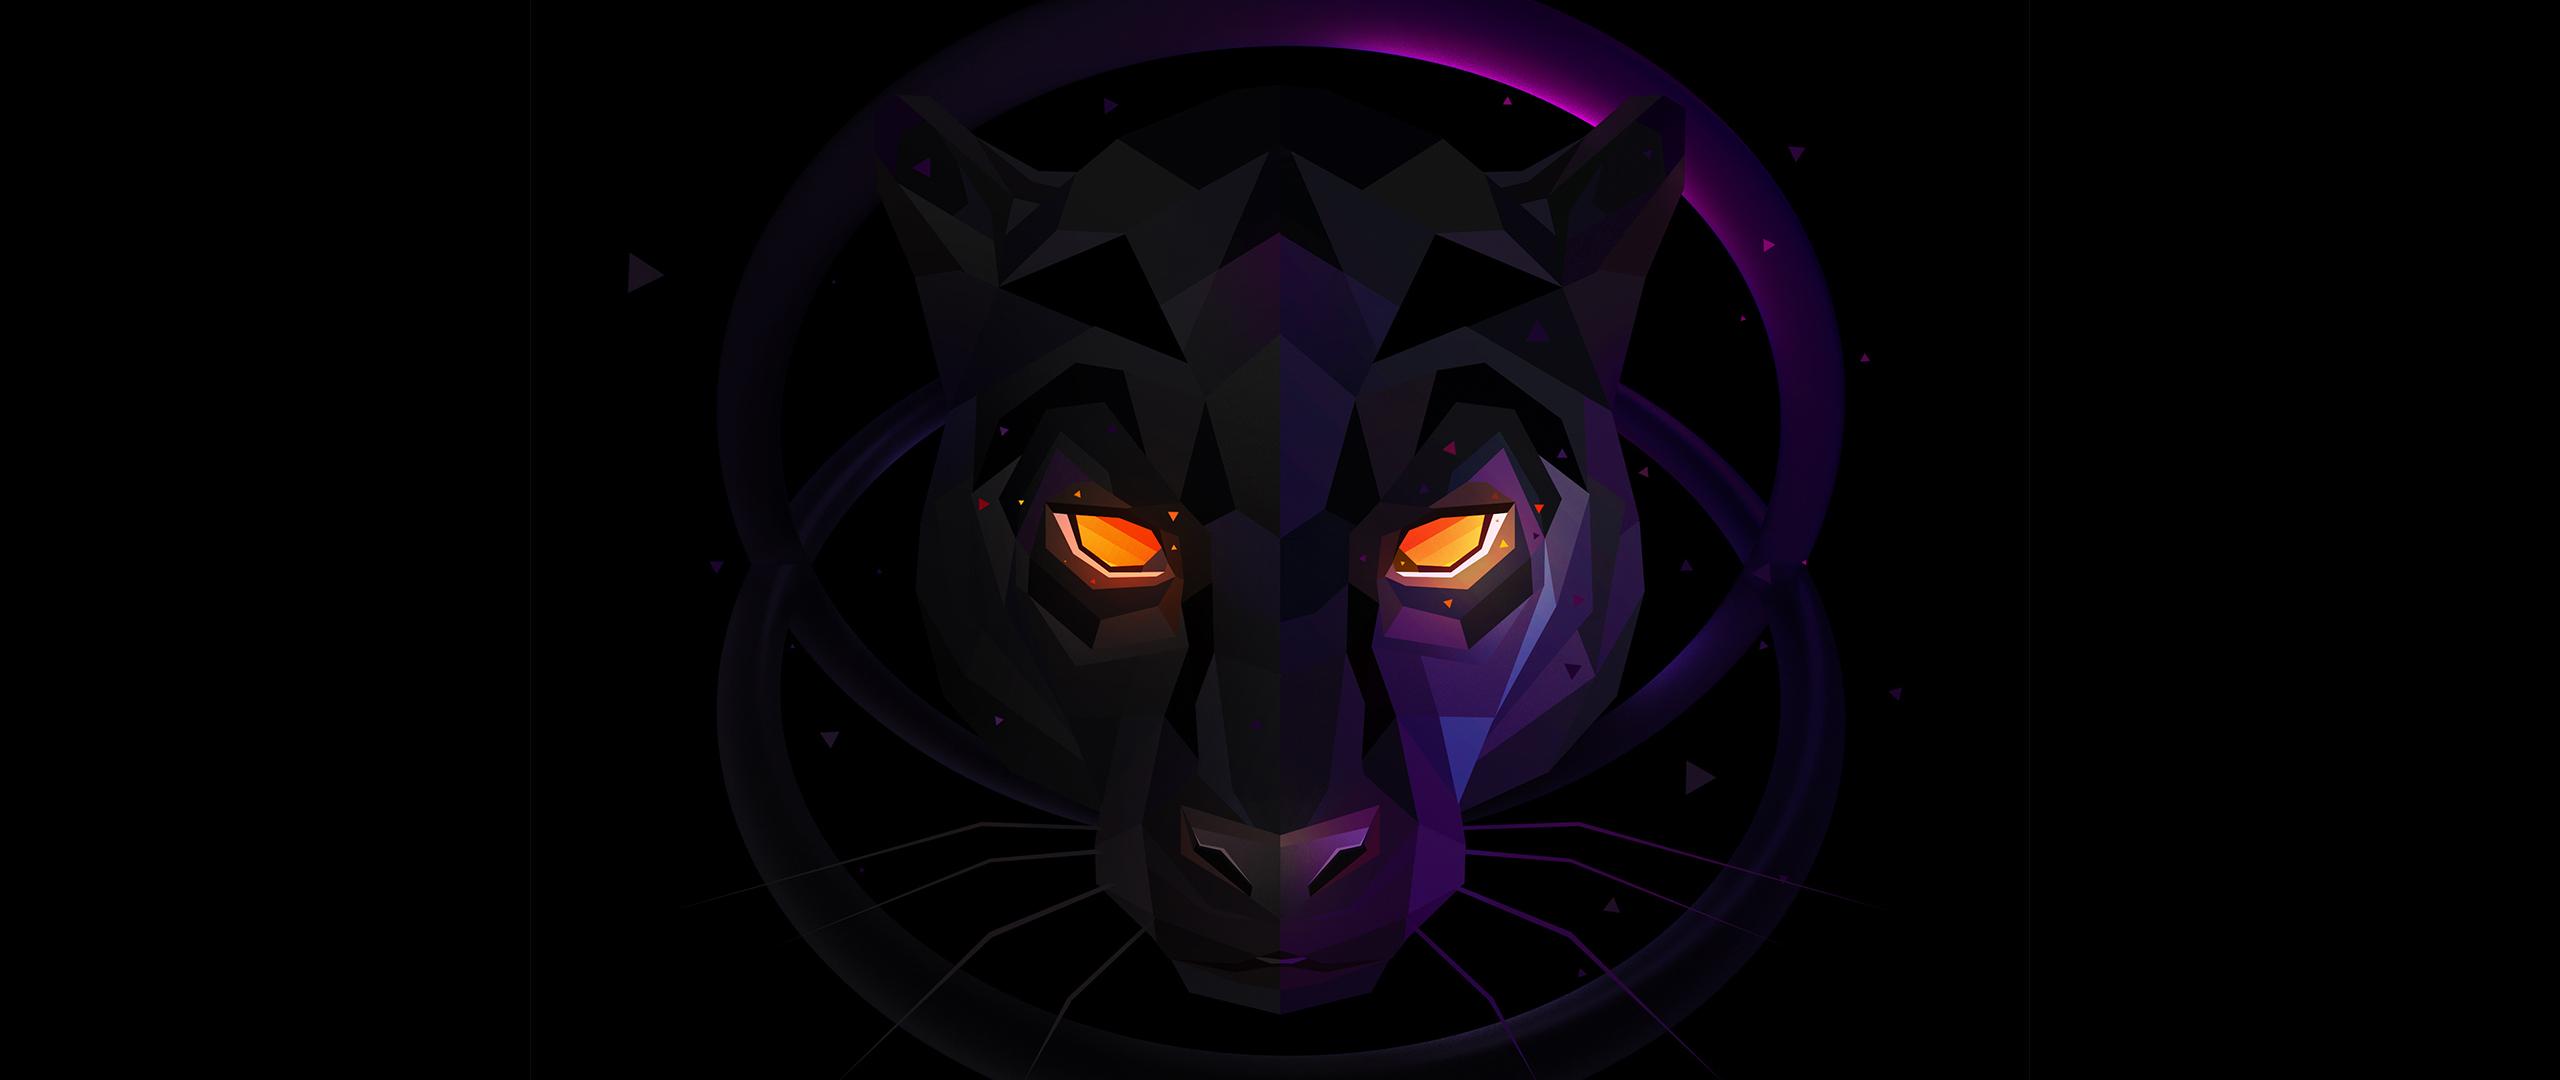 Desktop Wallpaper Black Panther Muzzle Dark Art Hd Image Picture Background 443bec